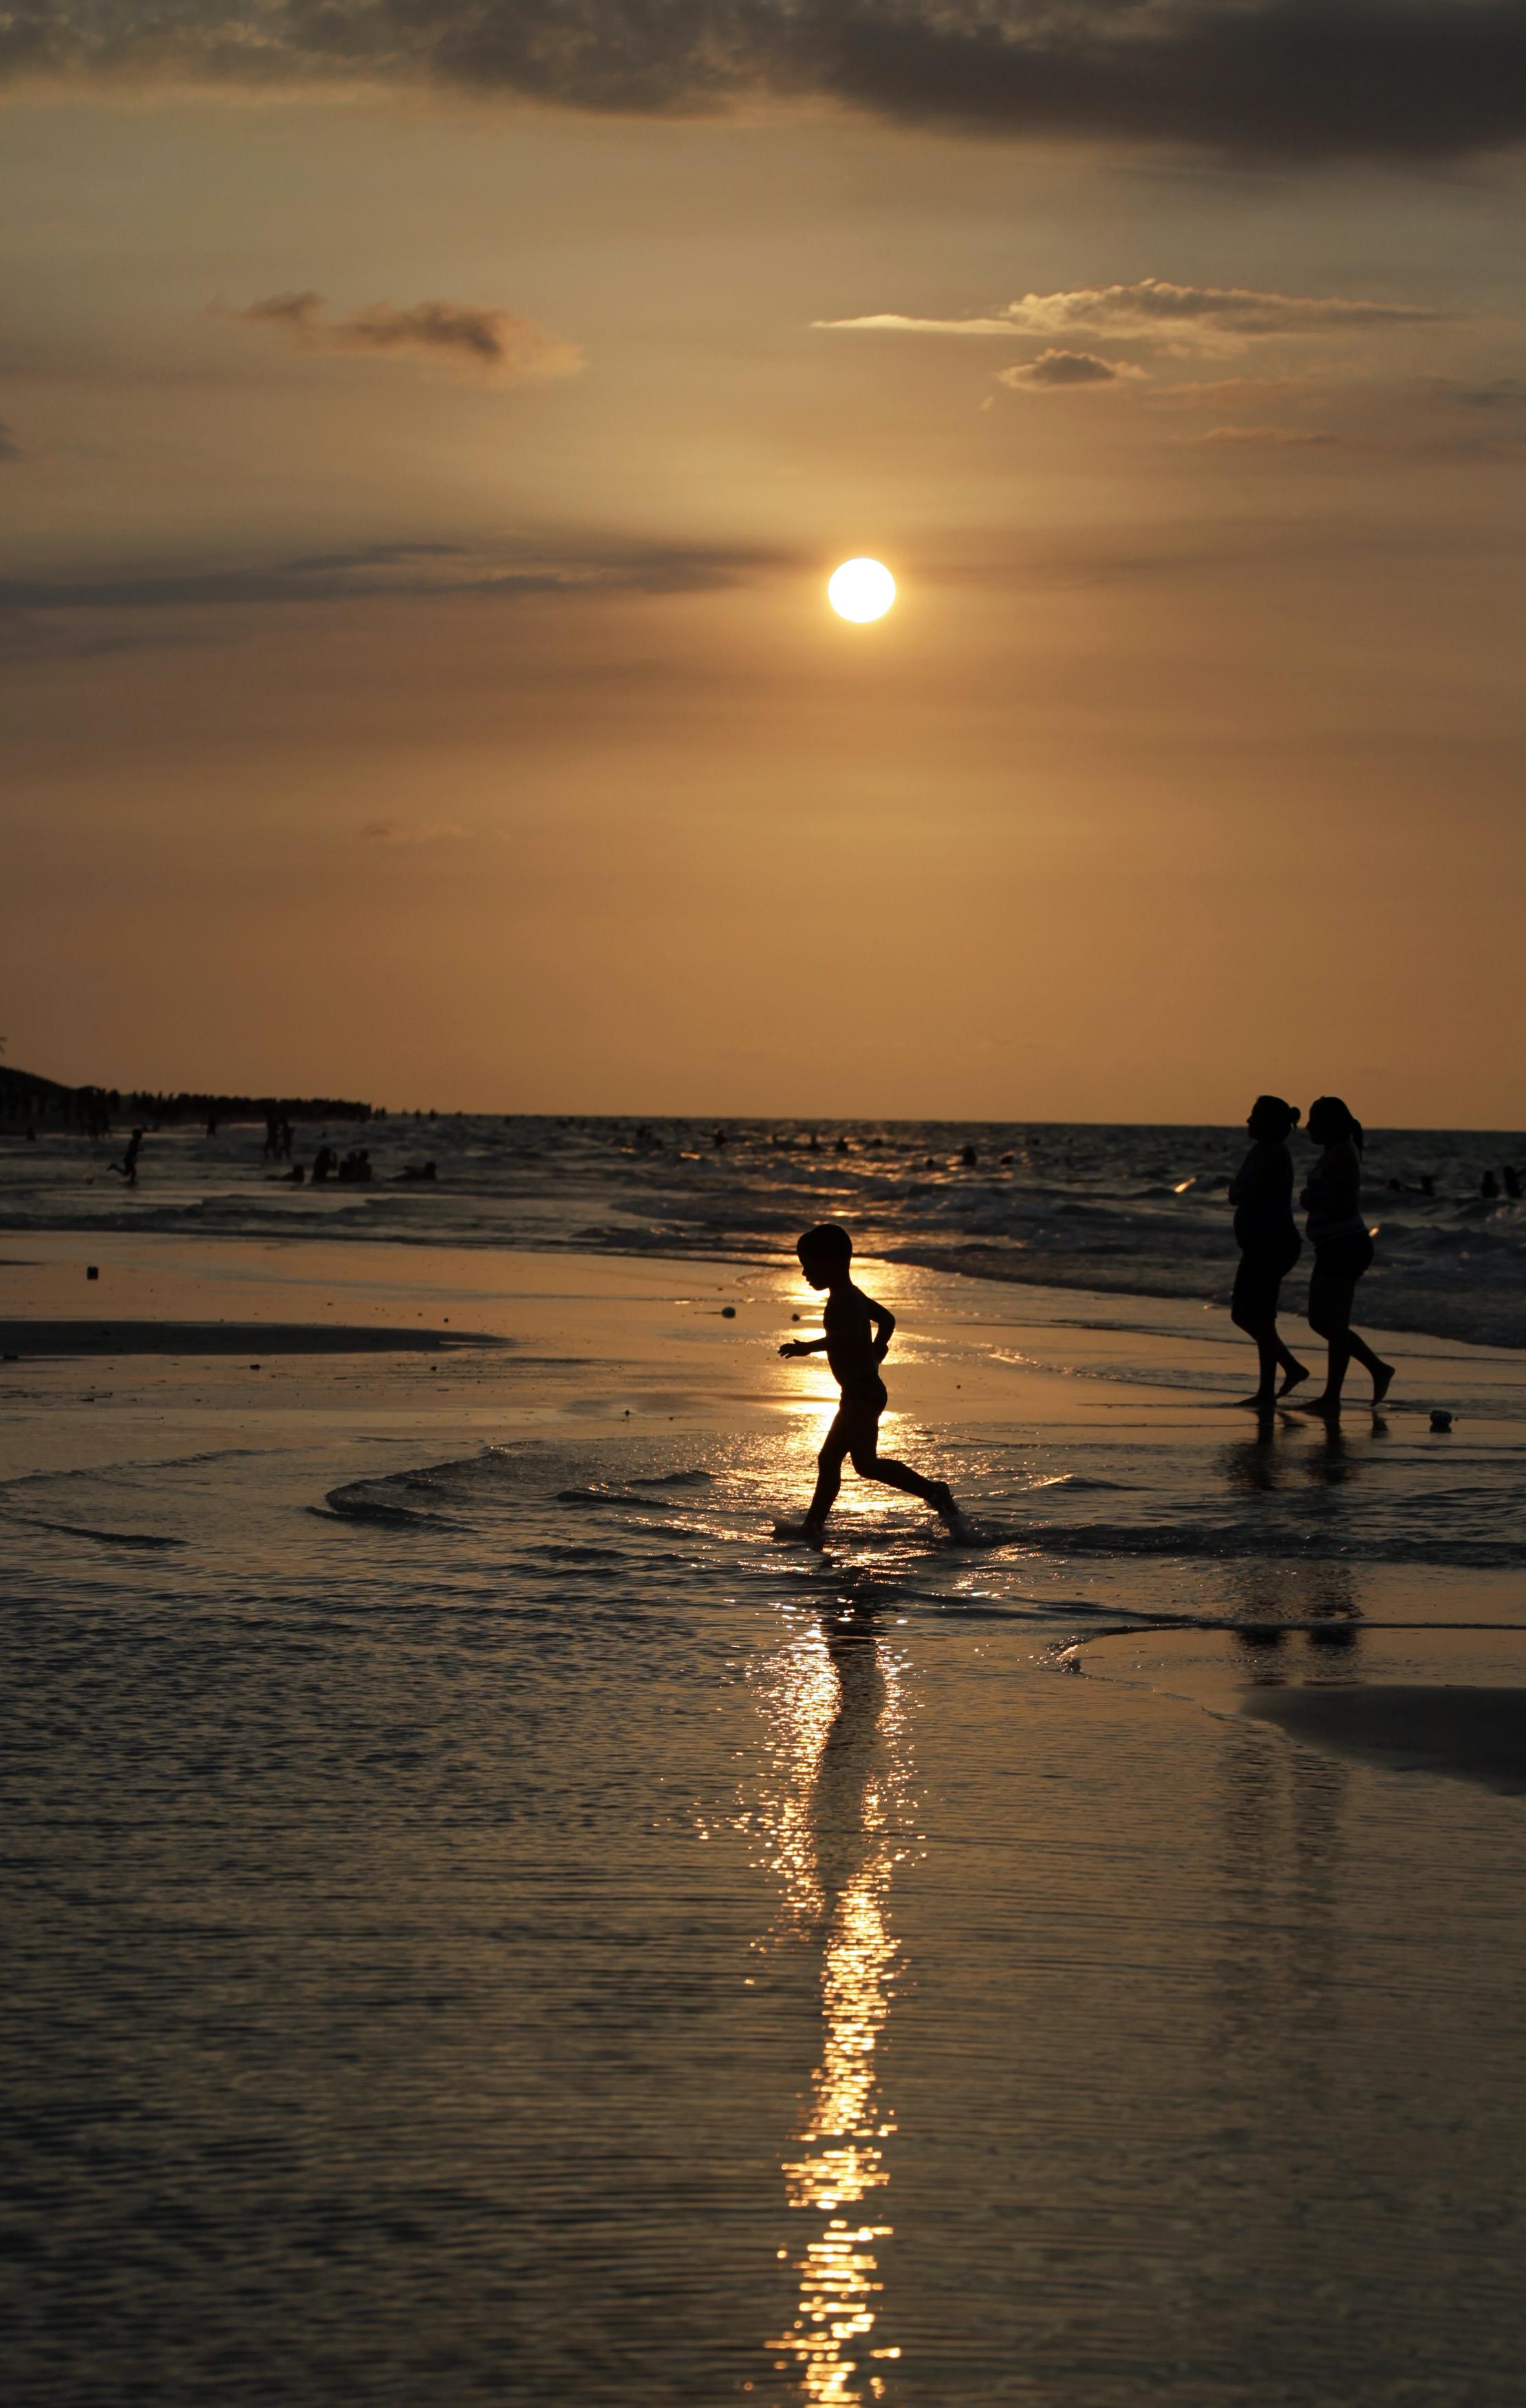 CUBA, 28.7.2013. Passeio ao pôr-do-sol numa praia perto de Havana